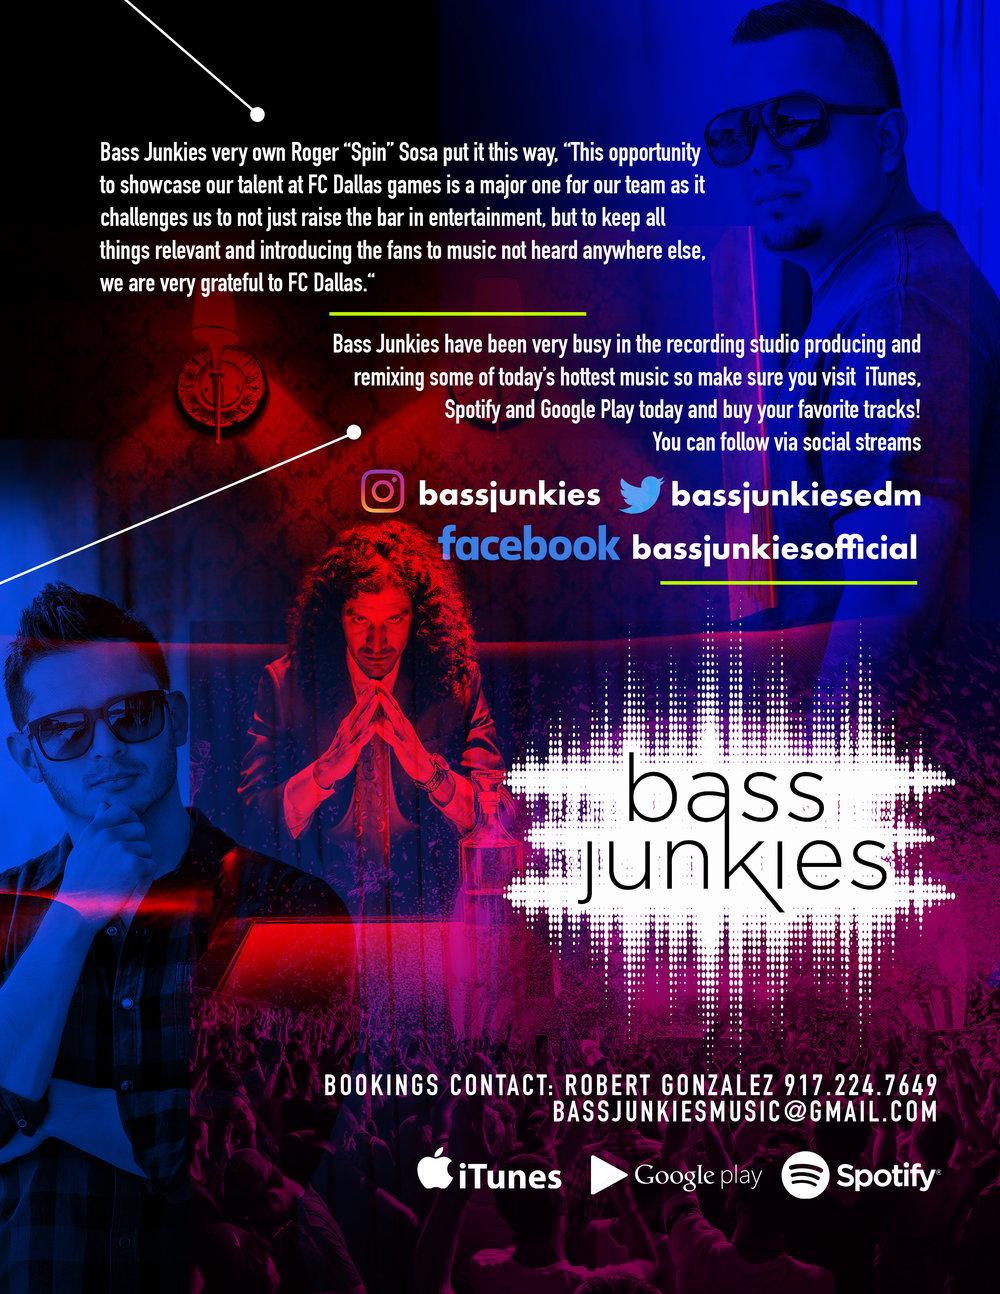 bass-junkies-epk-pg2-2.jpg